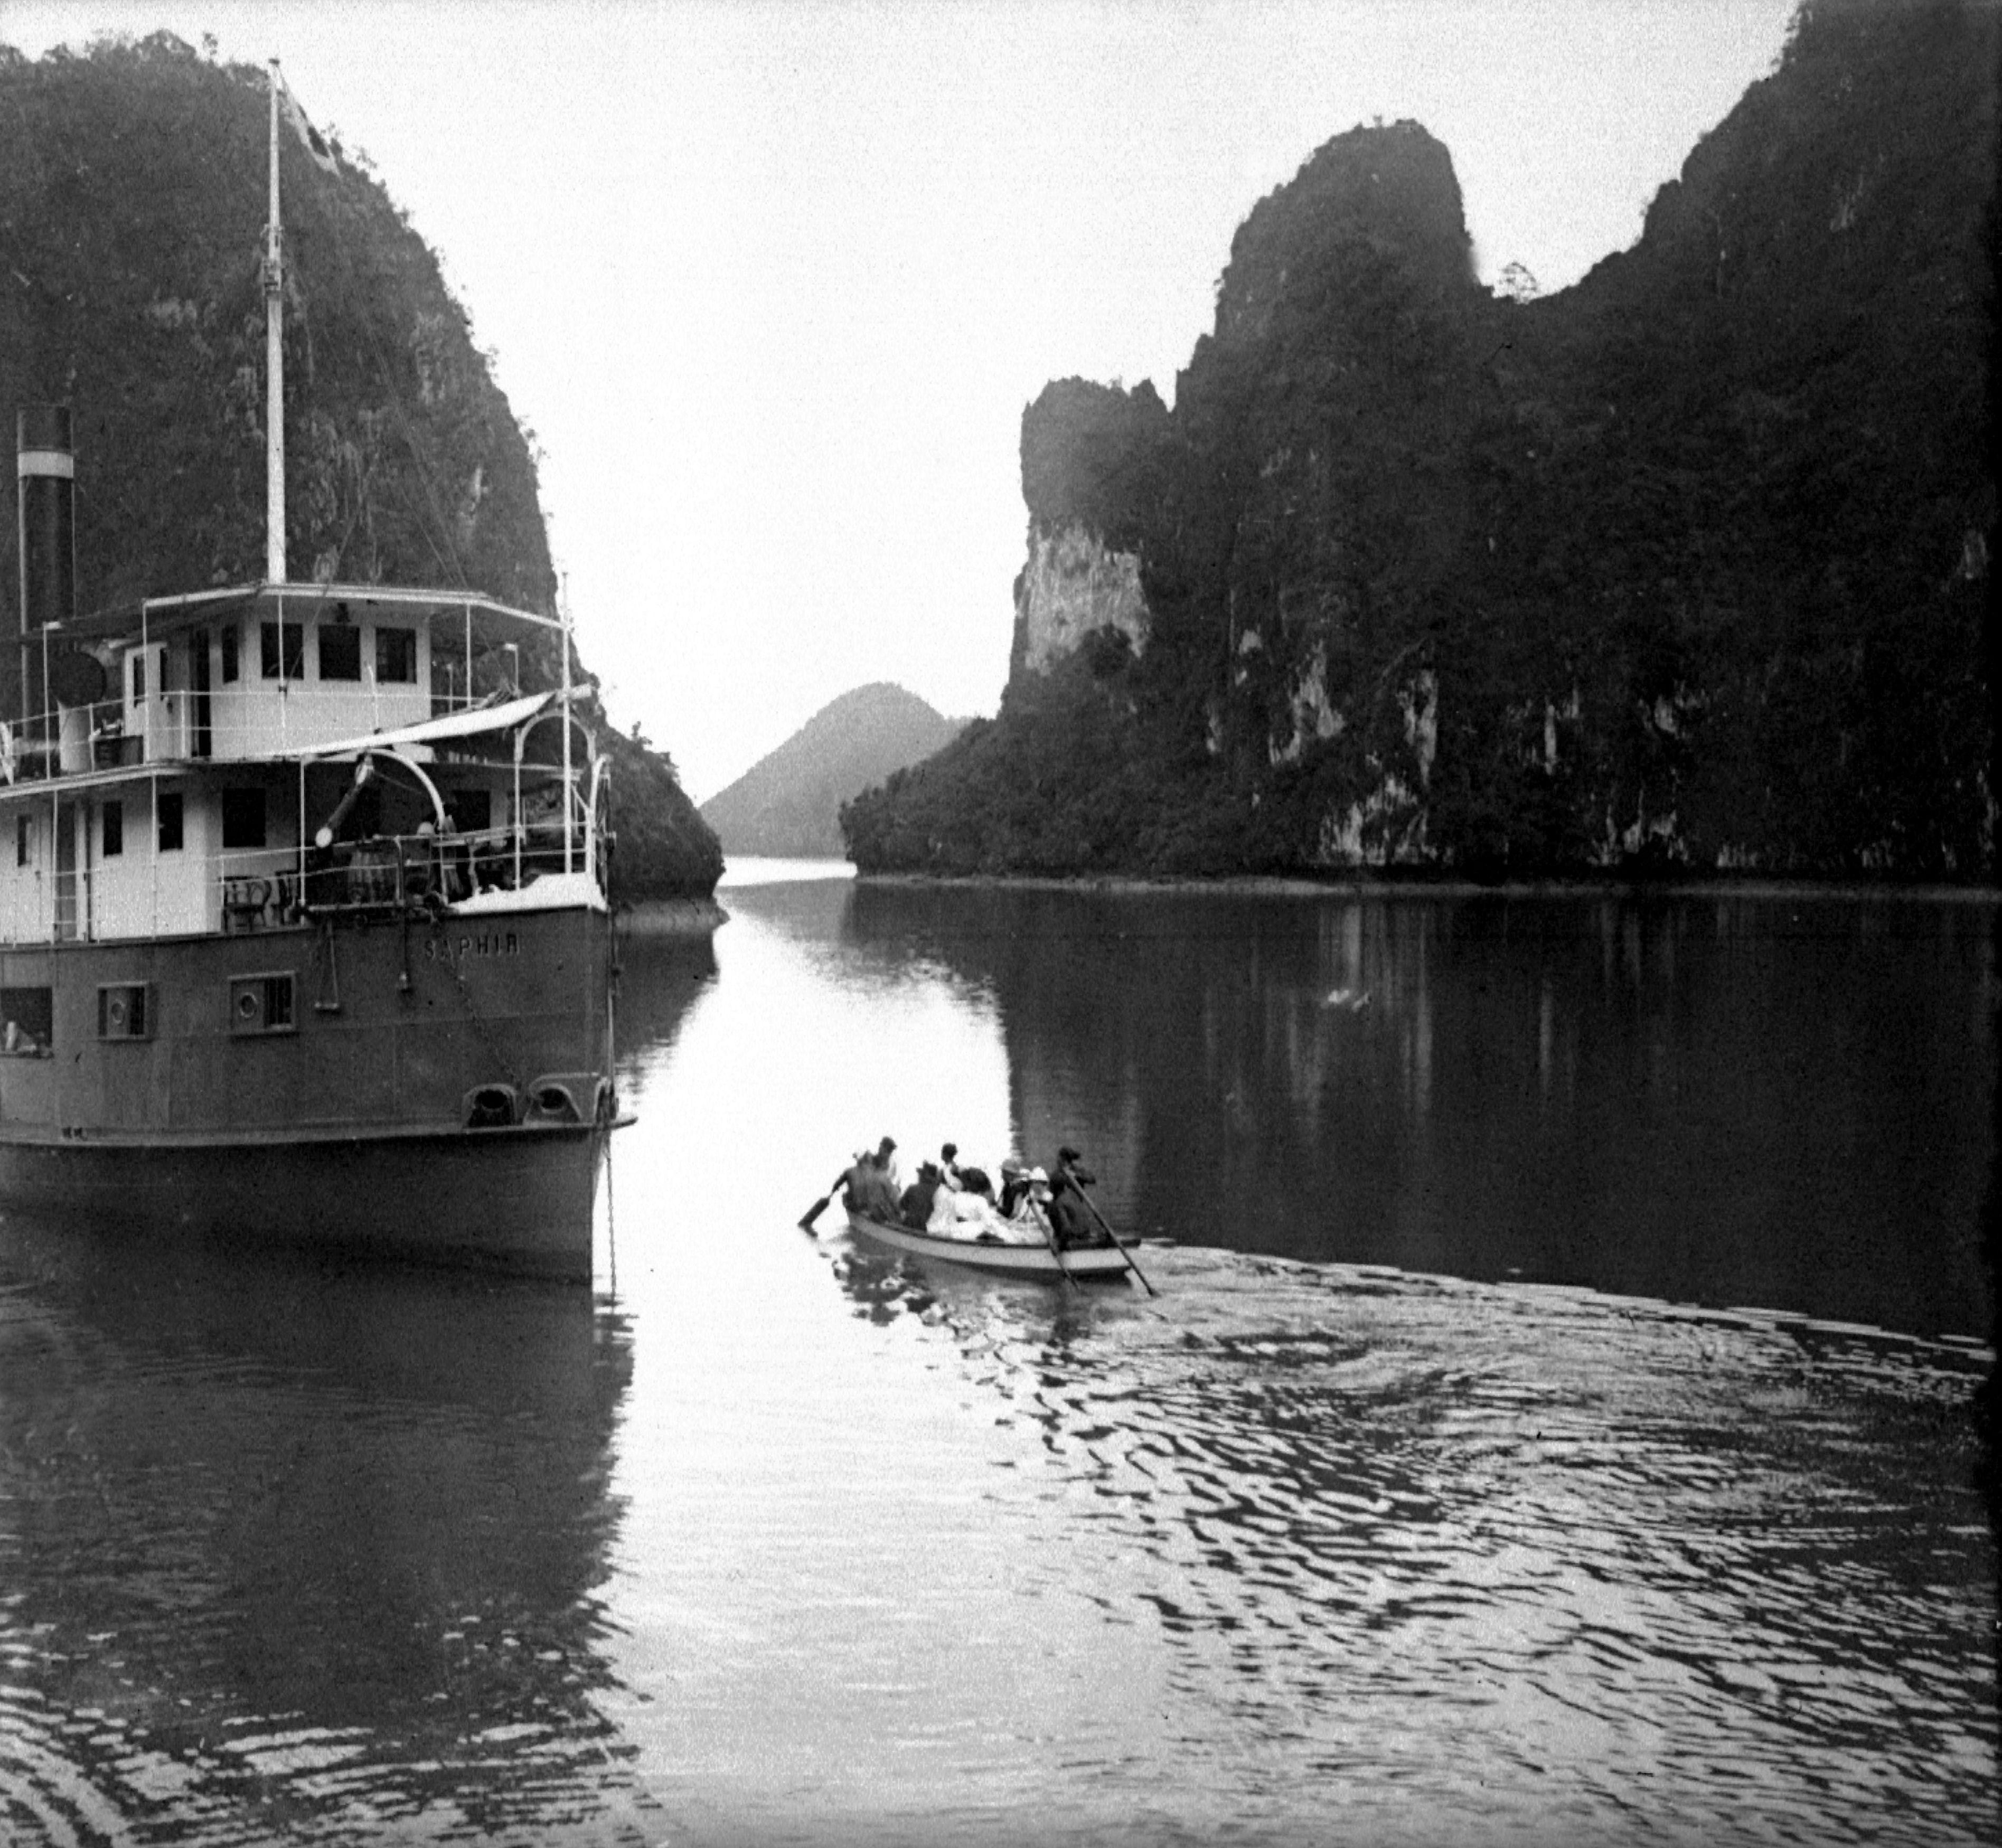 Vịnh Hạ Long Ha Long Bay Ha Long Best Cruise Ha Long Bay